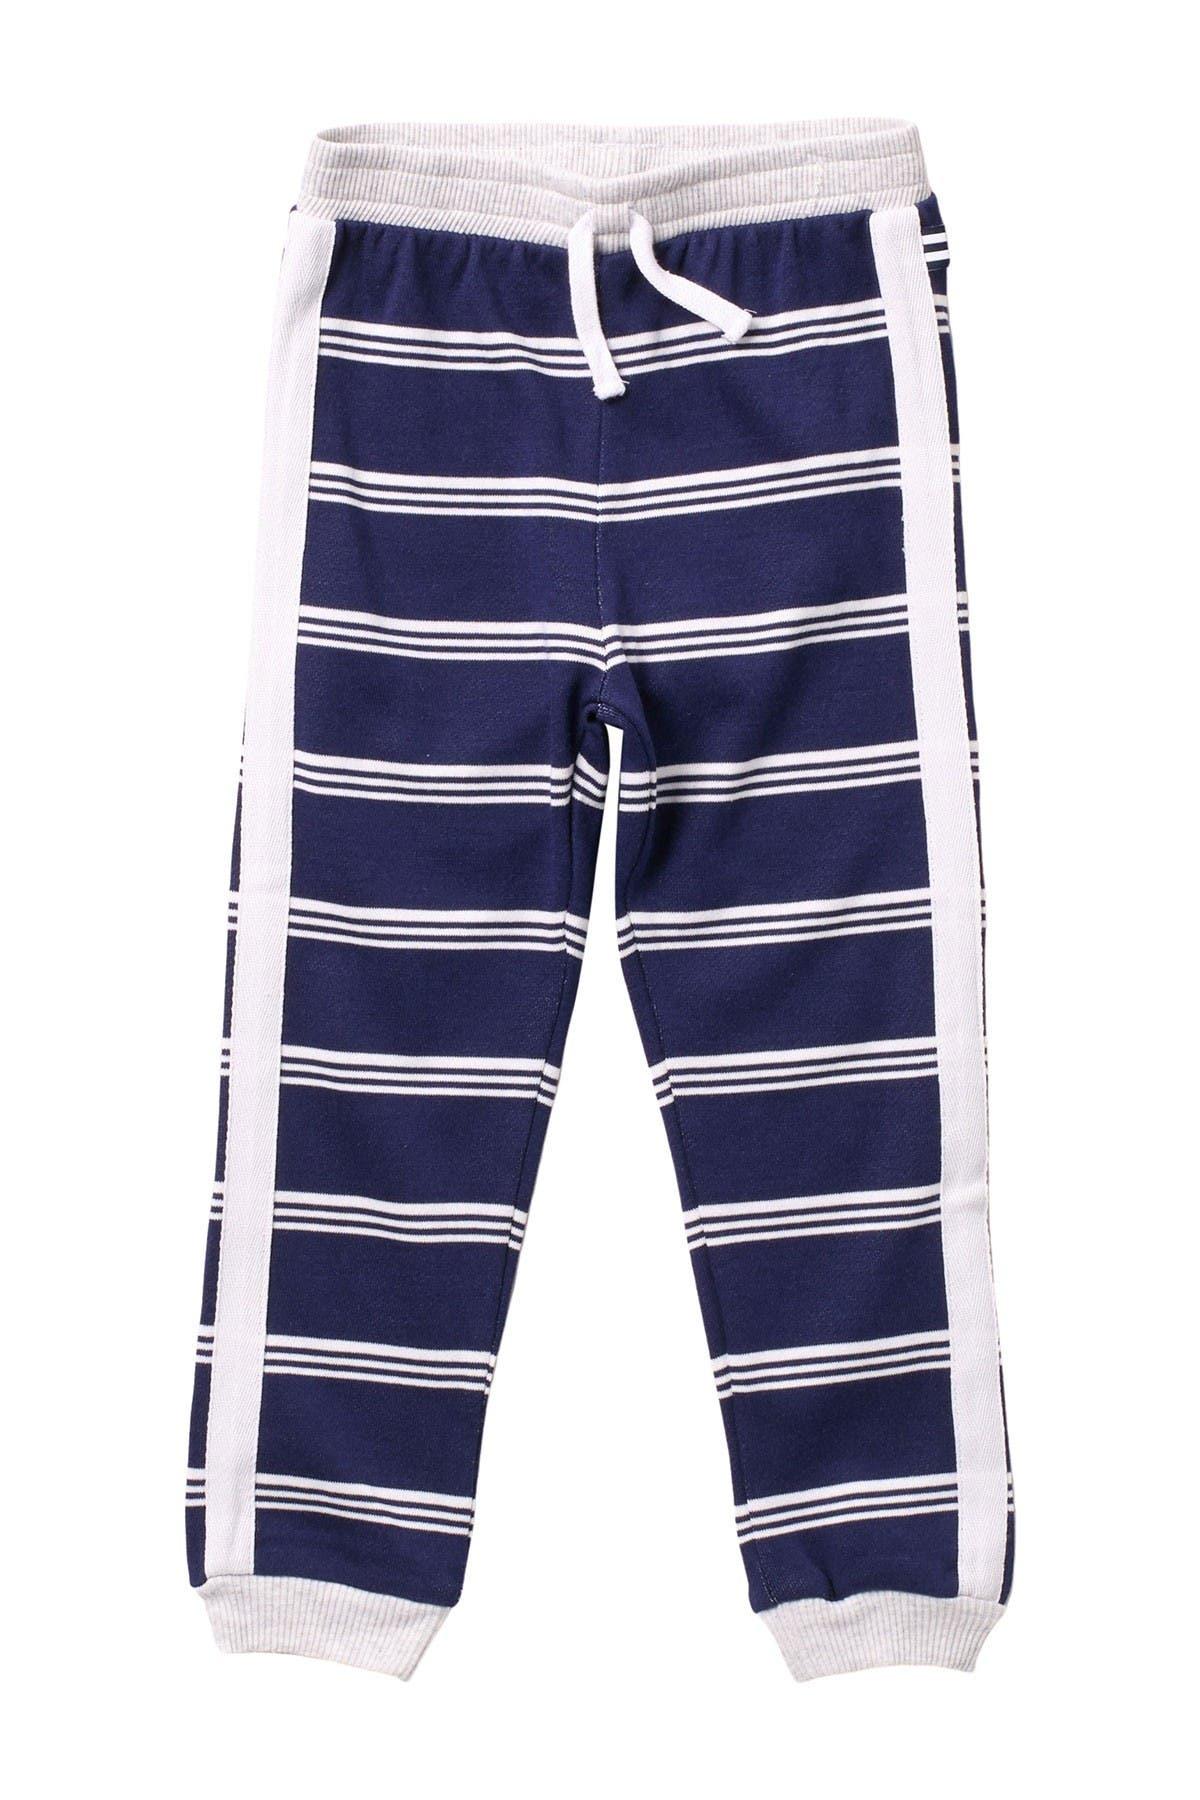 Image of Splendid Yard Stripe Jogger Pants